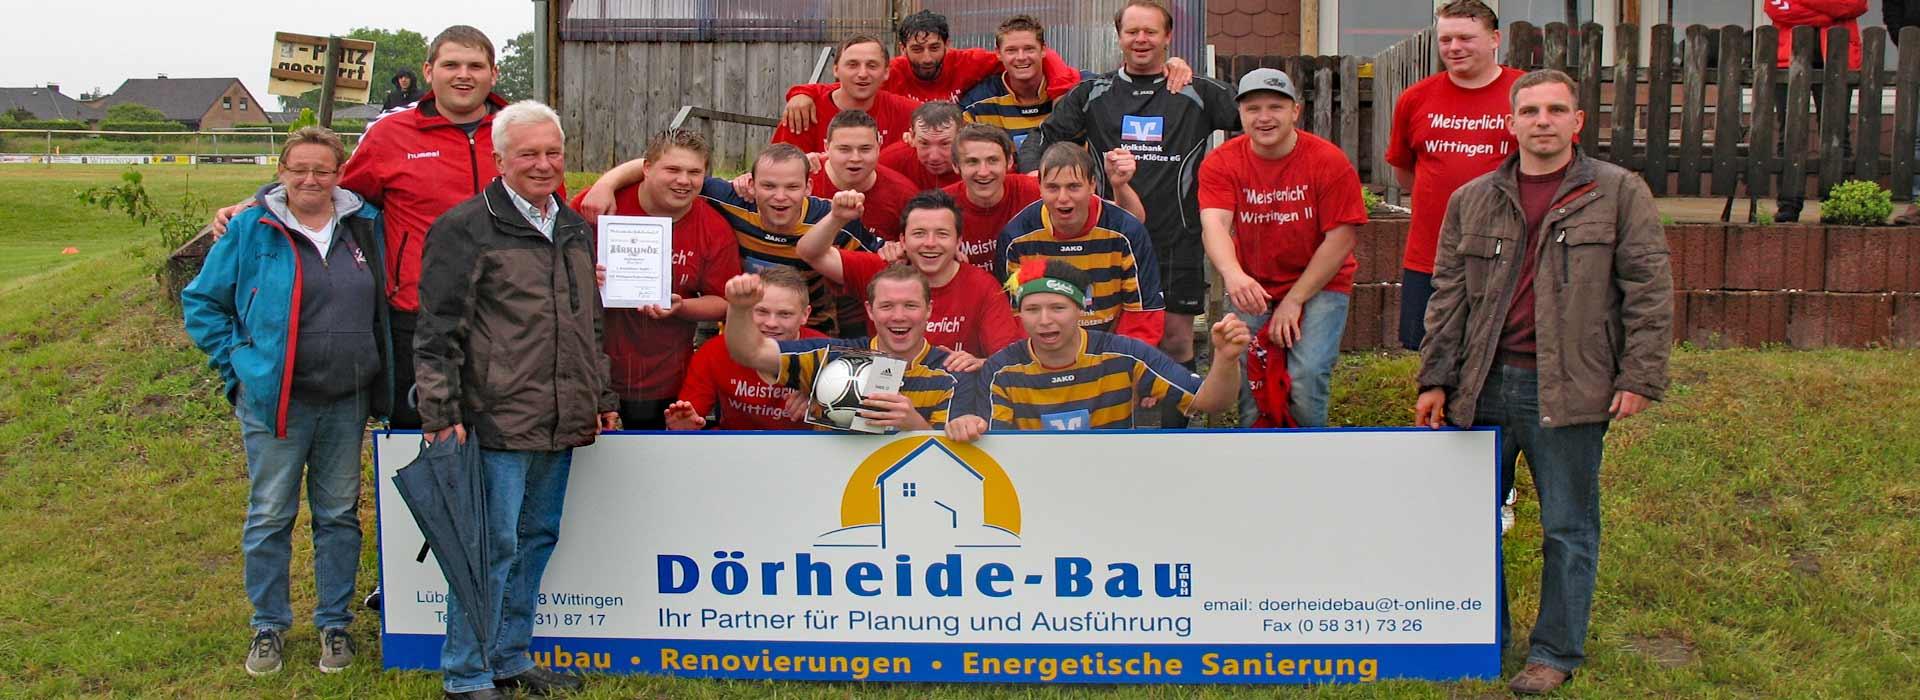 Dörheide-Bau Wittingen - Slider - Sponsoring